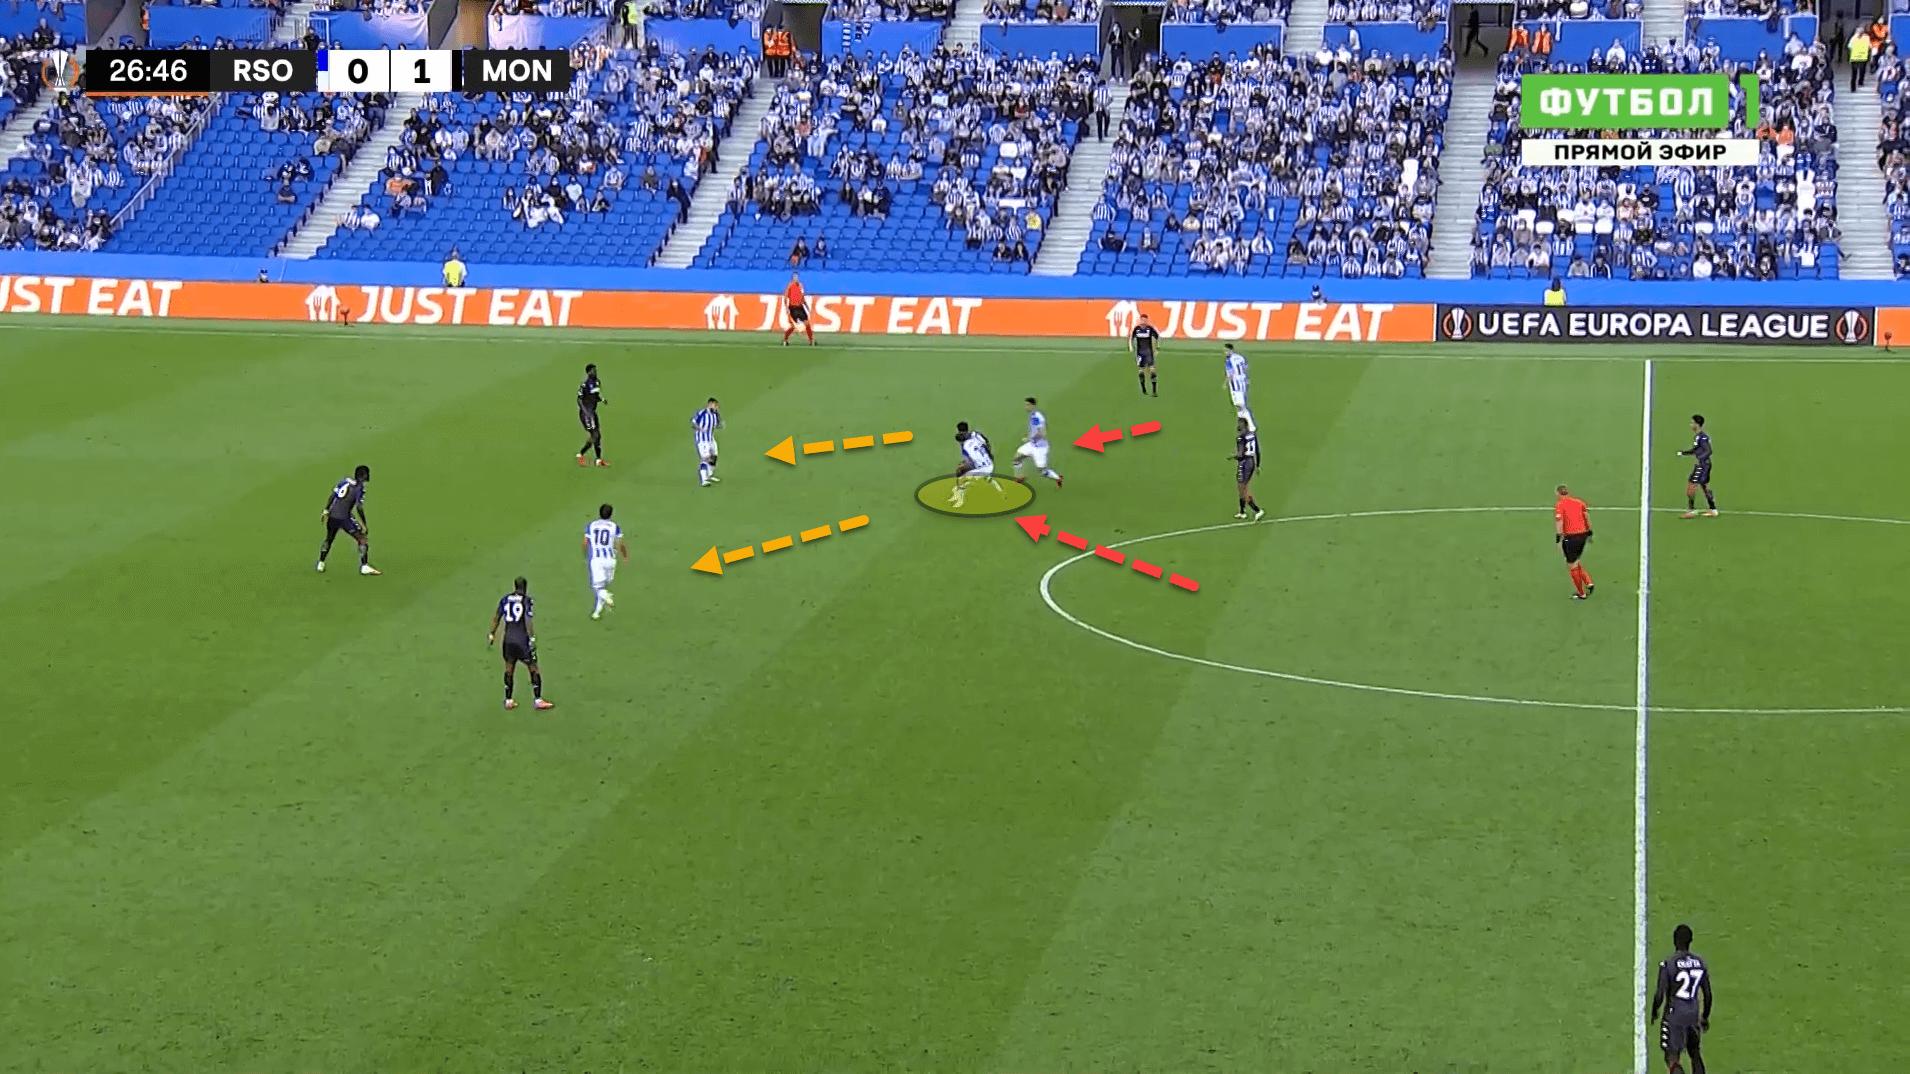 UEFA Europa League: How Real Sociedad struggled to break down AS Monaco's deep defensive block – tactical analysis